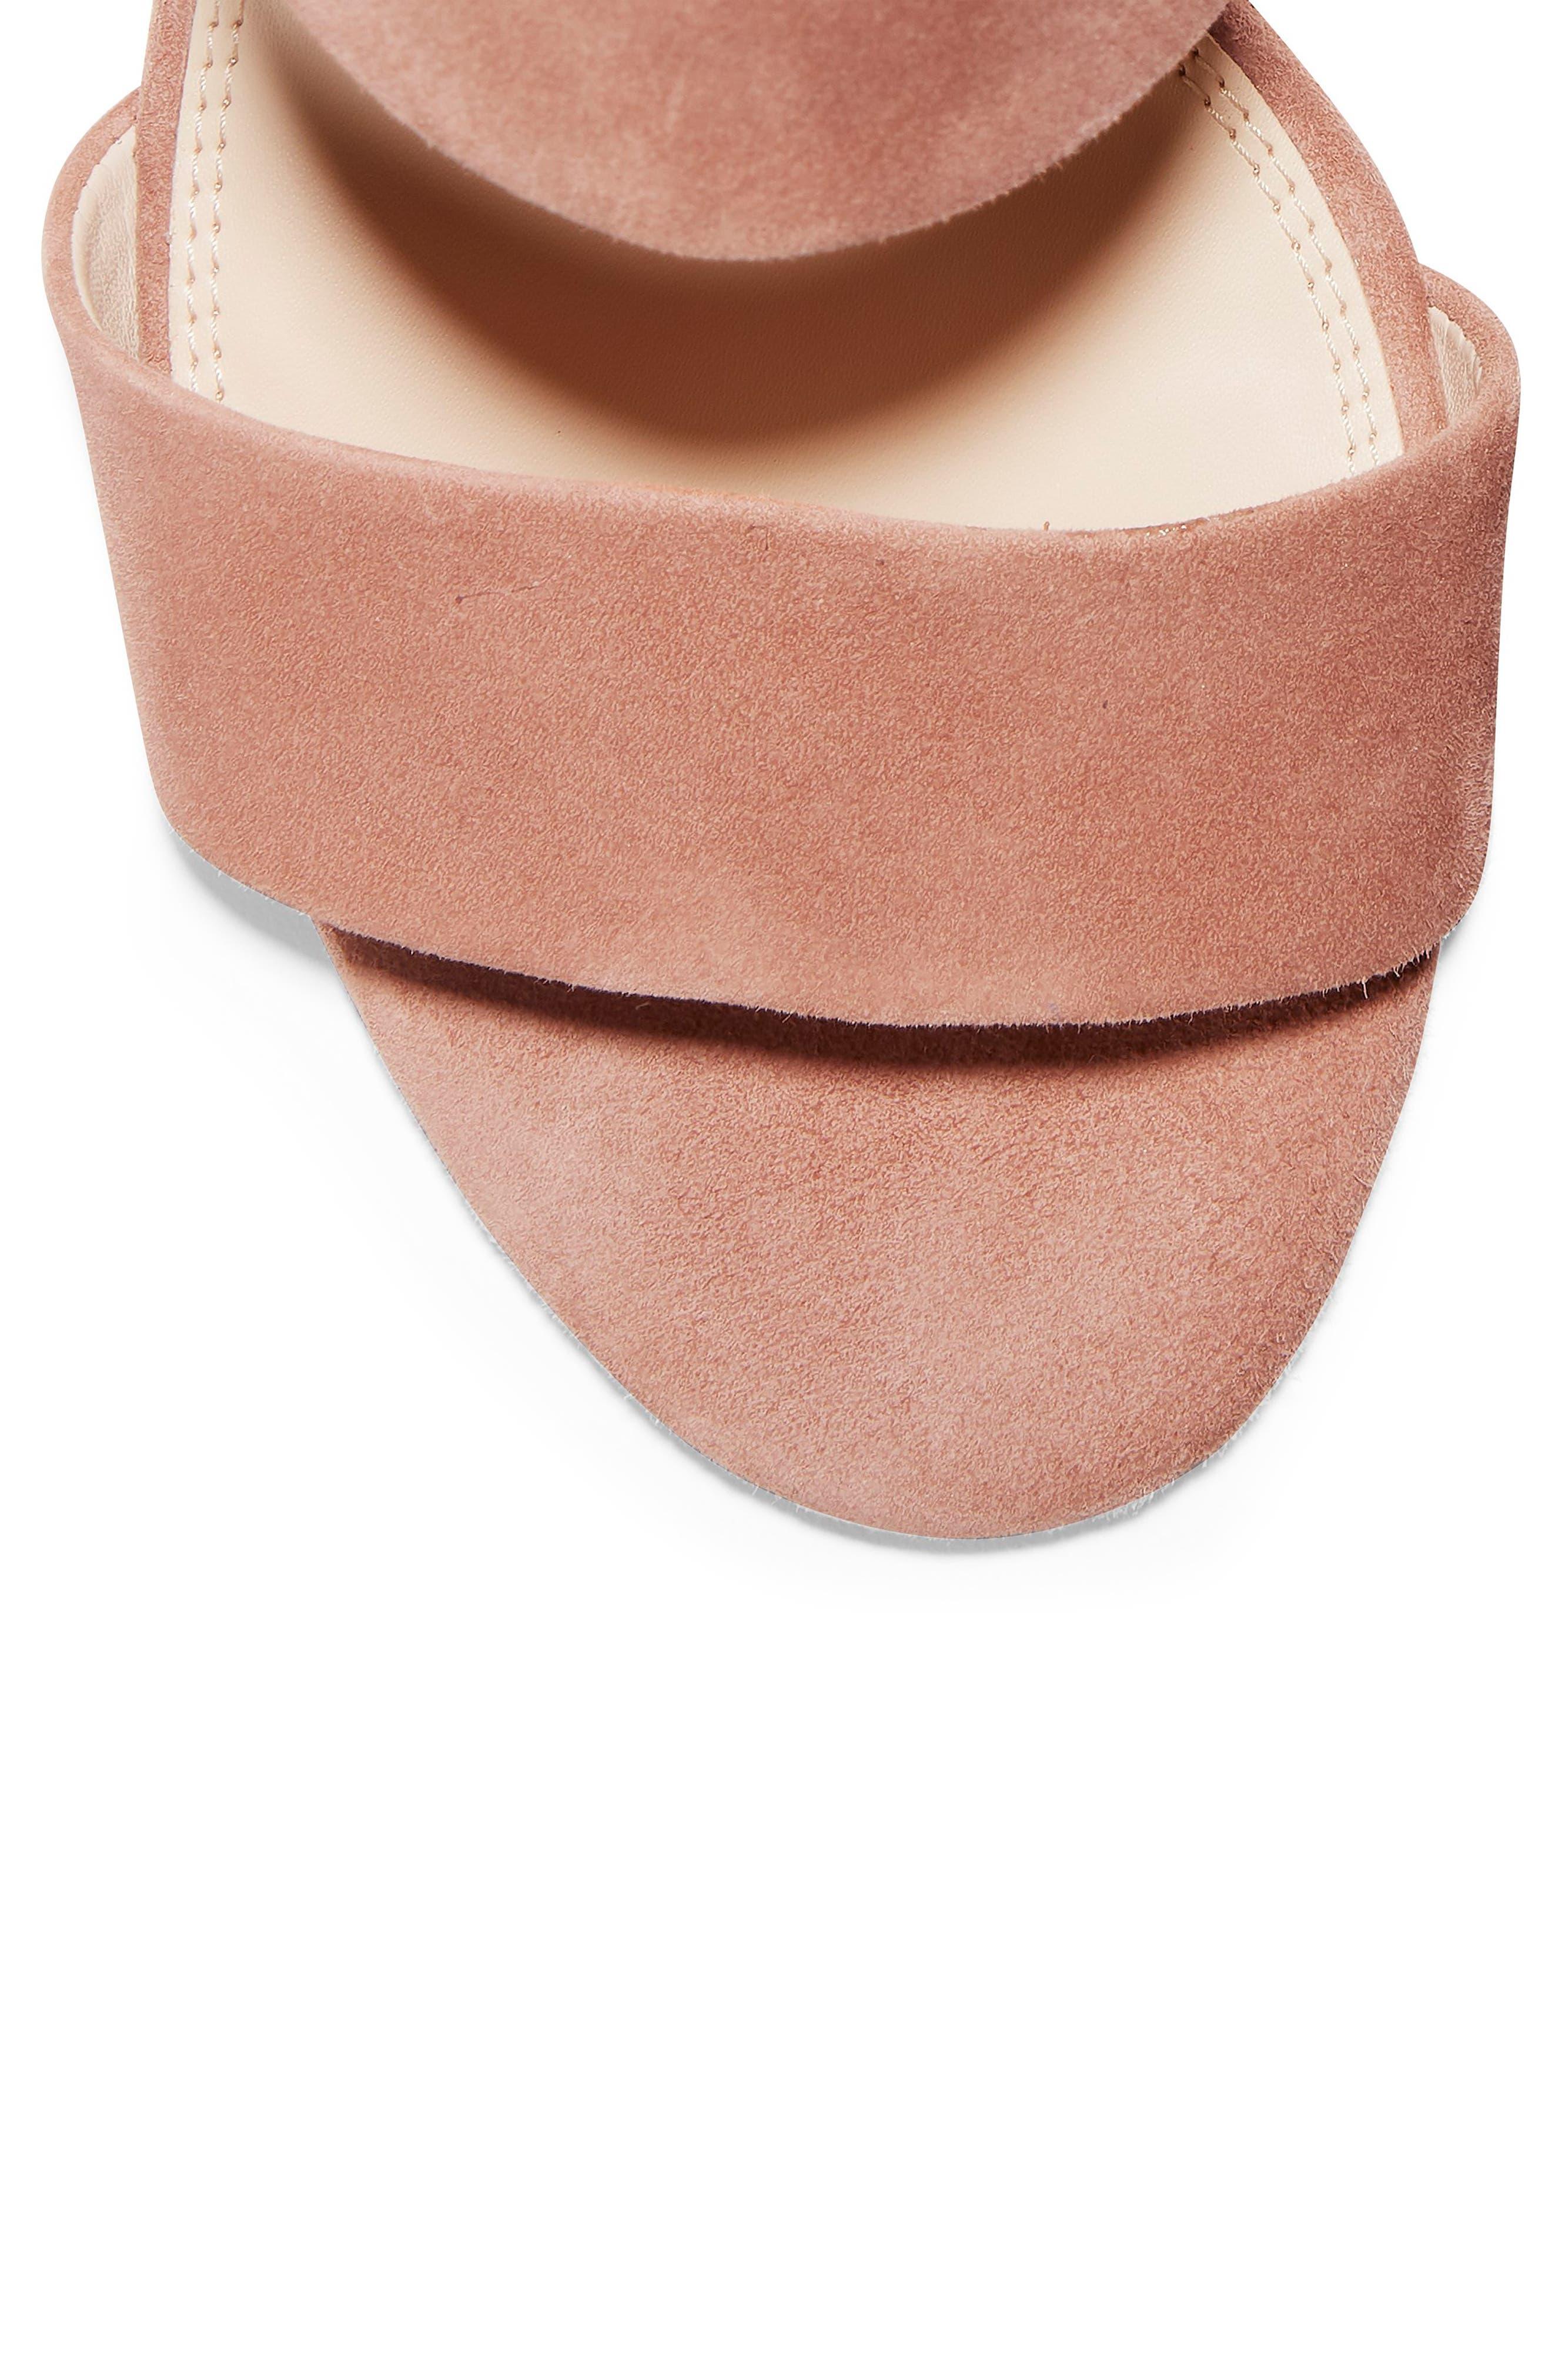 Avani Block Heel Sandal,                             Alternate thumbnail 7, color,                             MOCHA MOUSSE SUEDE